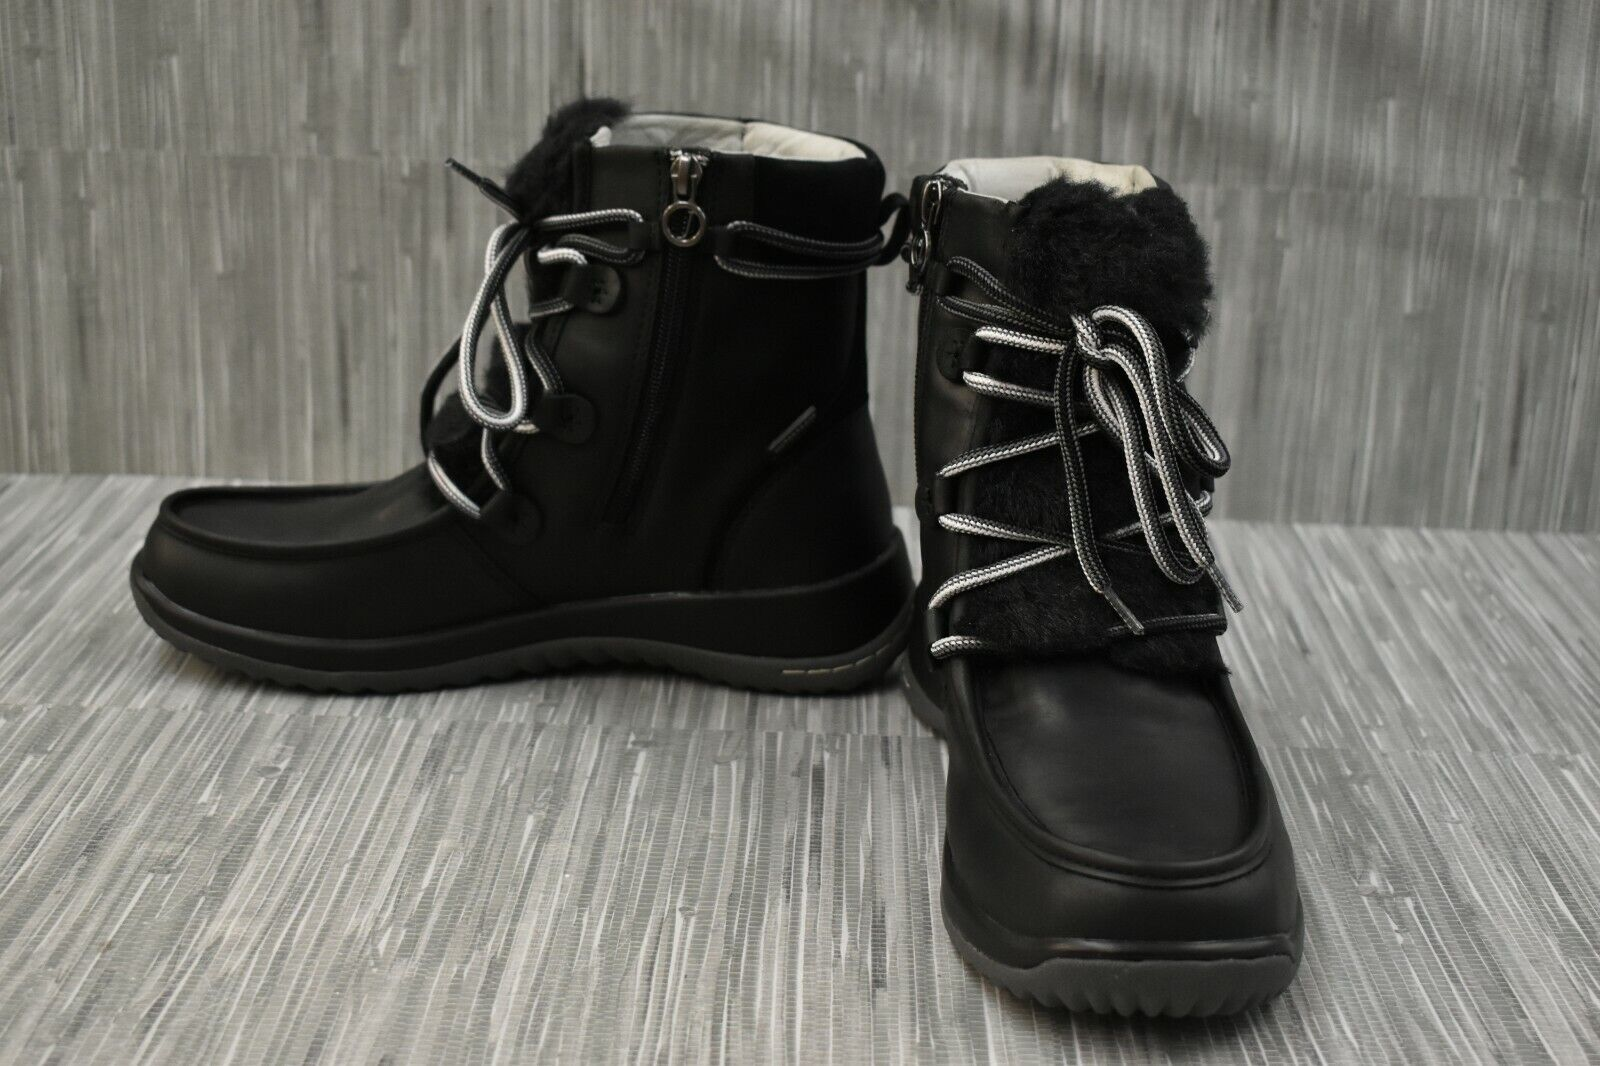 Jambu Denali WJ17DLI01 WP Boots - Women's Size 9.5M, Black